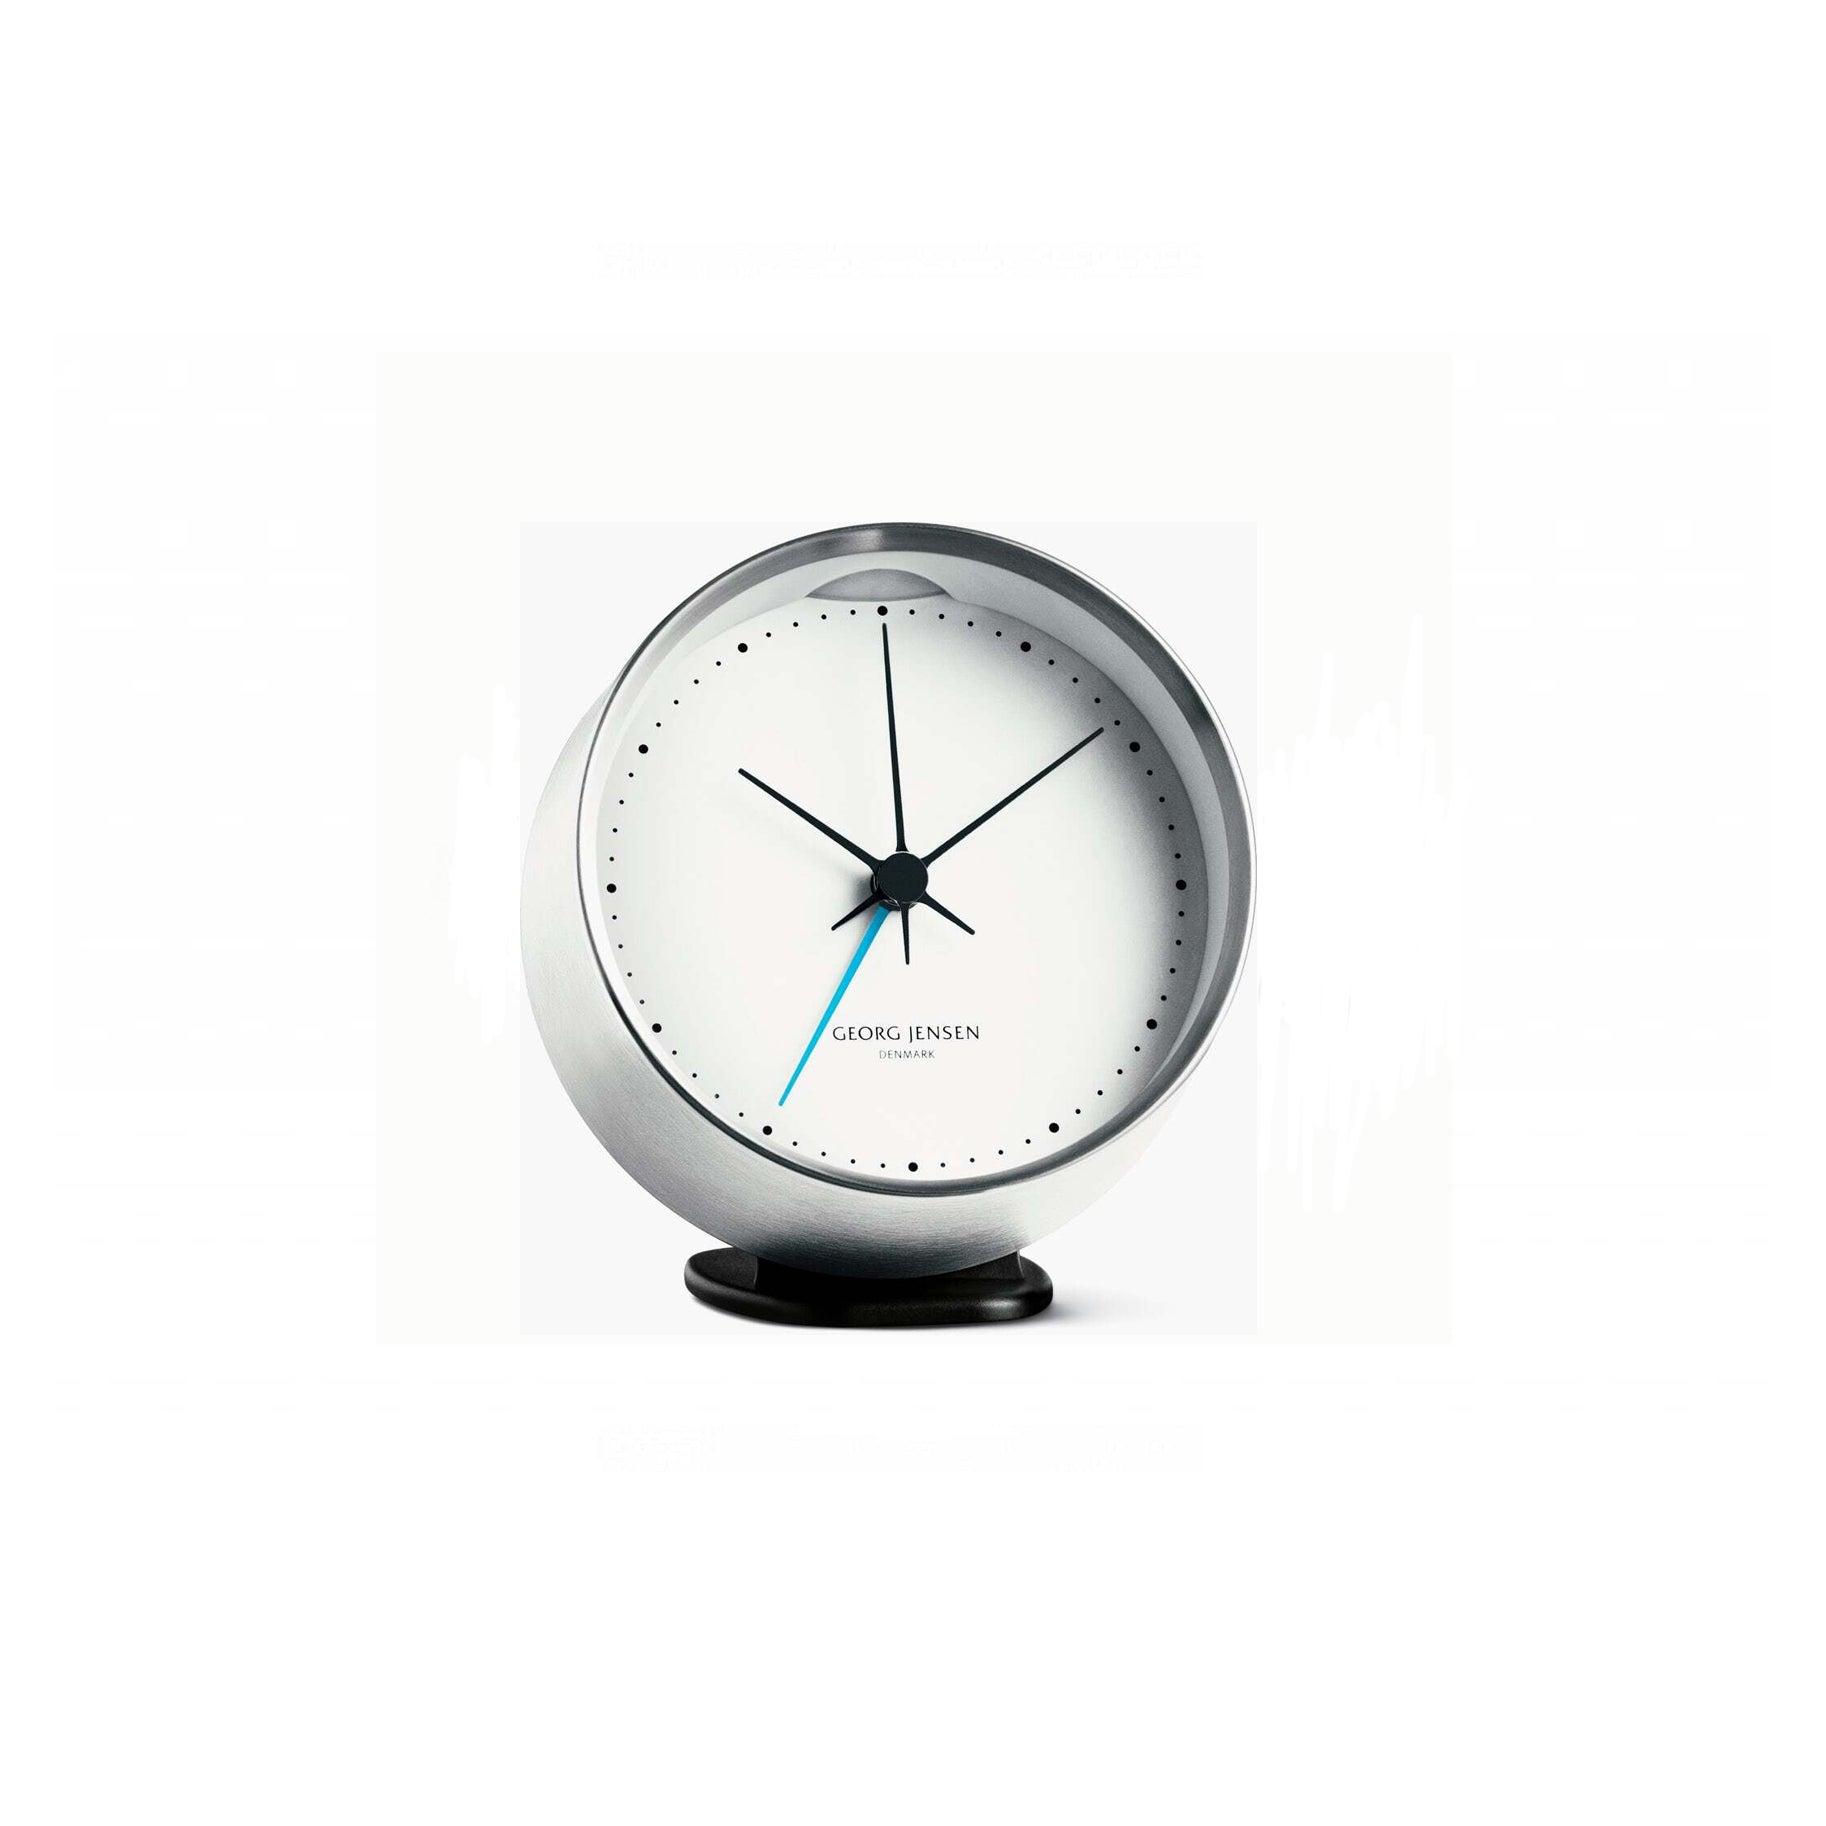 The-Best-Alarm-Clock-Option-Georg-Jensen-HK-Alarm-Clock